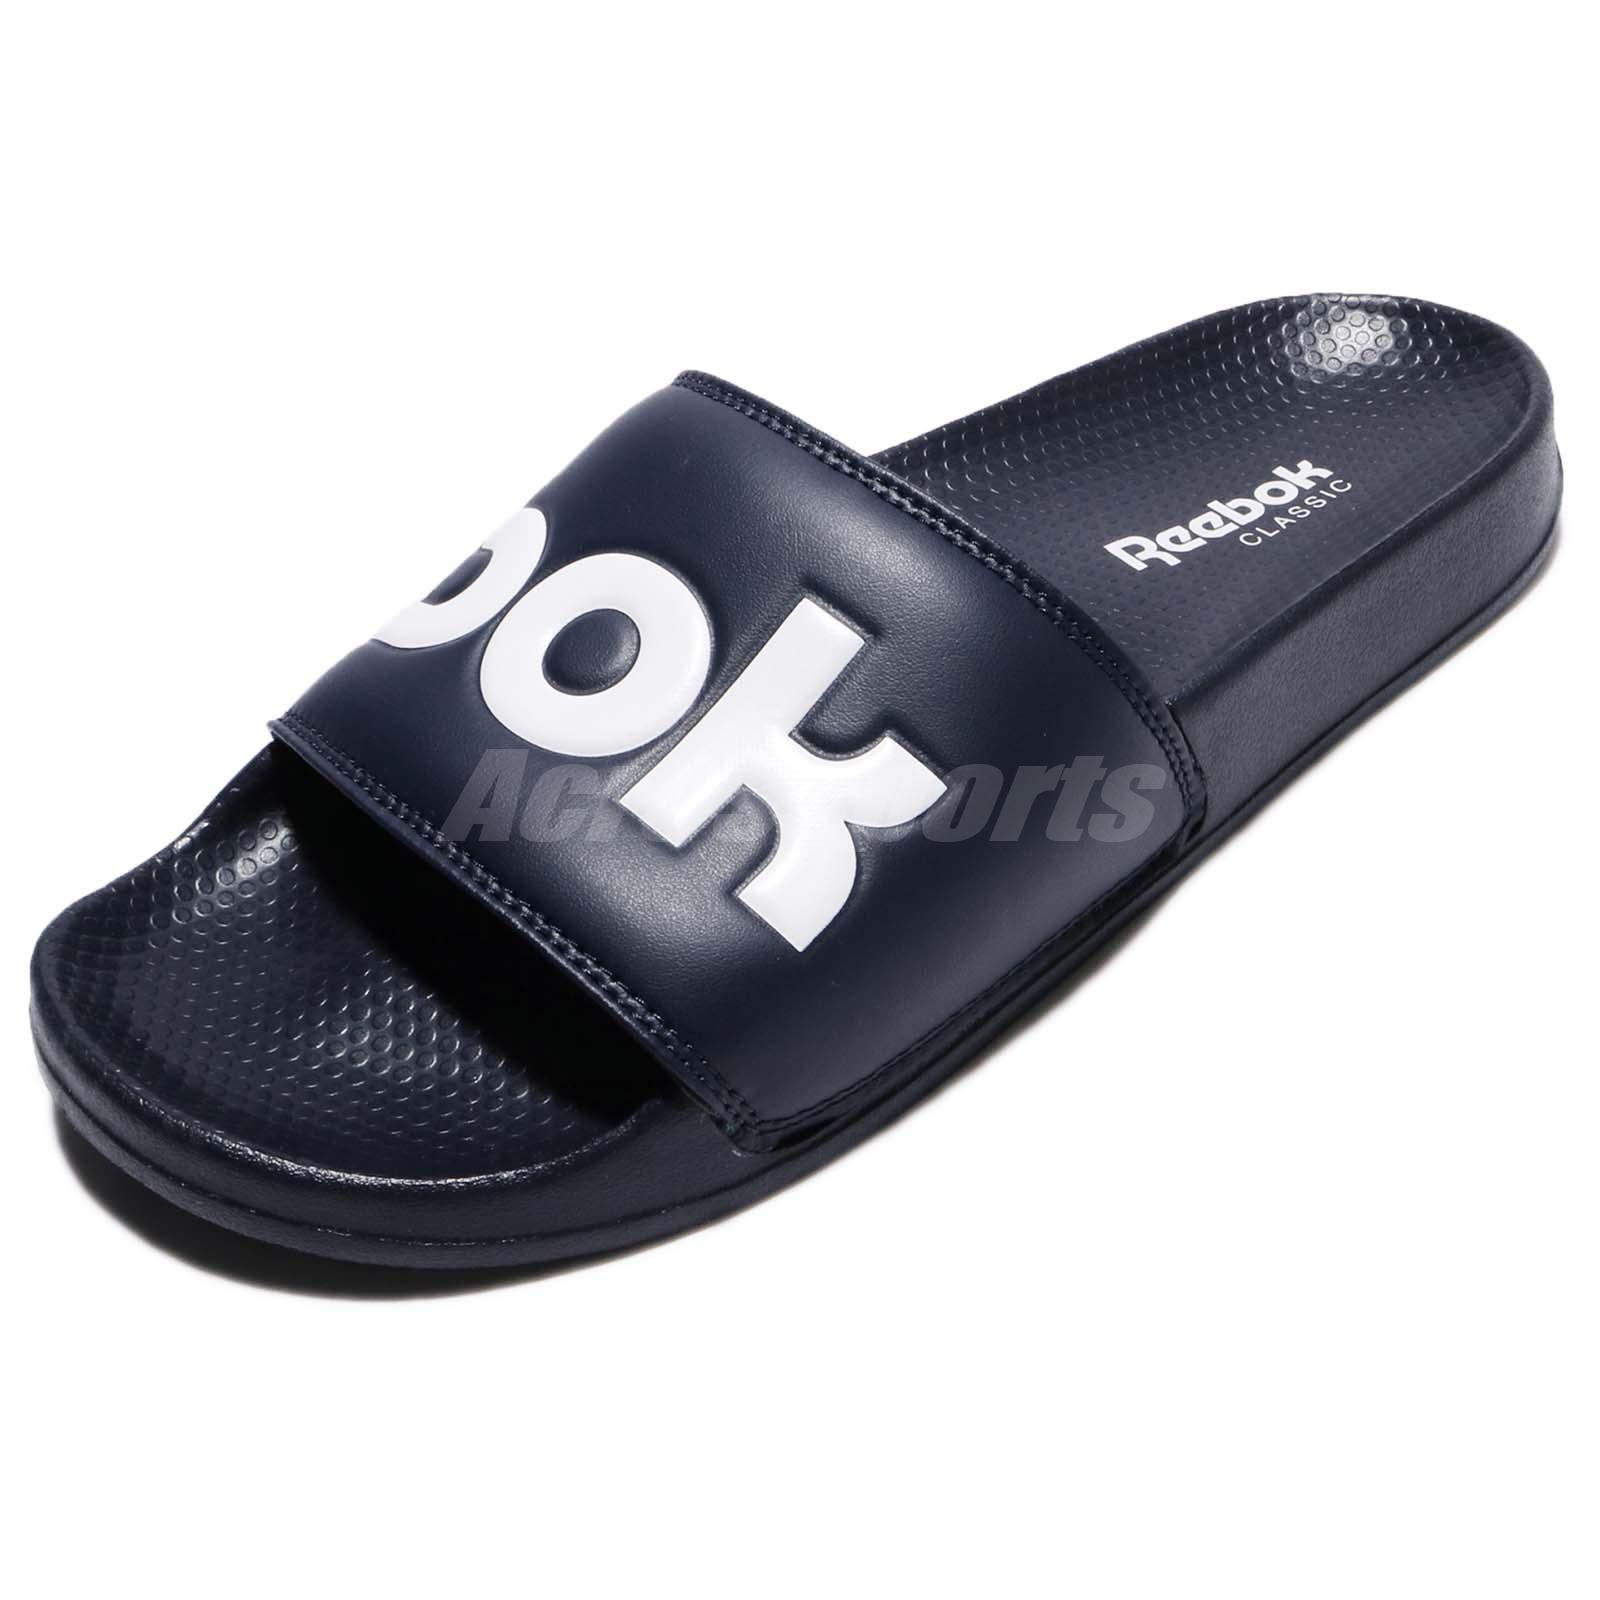 f6943635df0d Details about Reebok Classic Slide Collegiate Navy Rubber Men Sports Sandal  Slippers BS8186